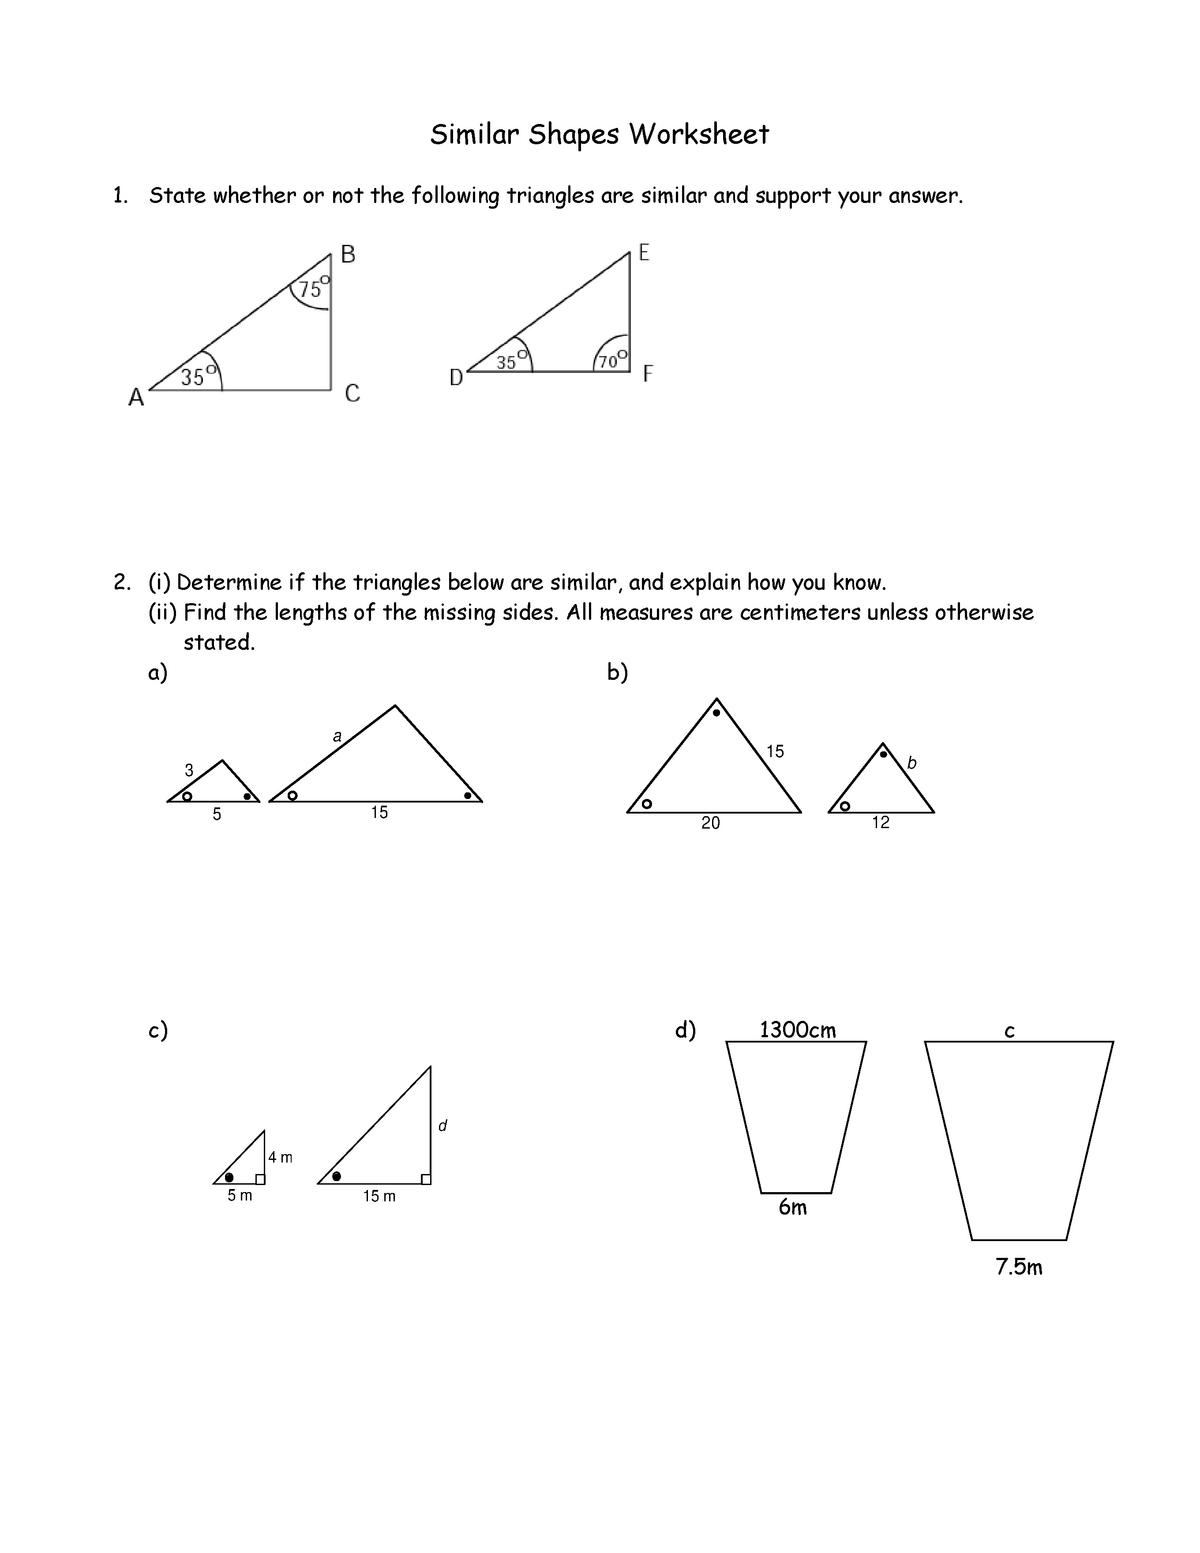 Similar Triangles Worksheet-24 - Similar Shapes Worksheet State Intended For Similar Figures Worksheet Answers